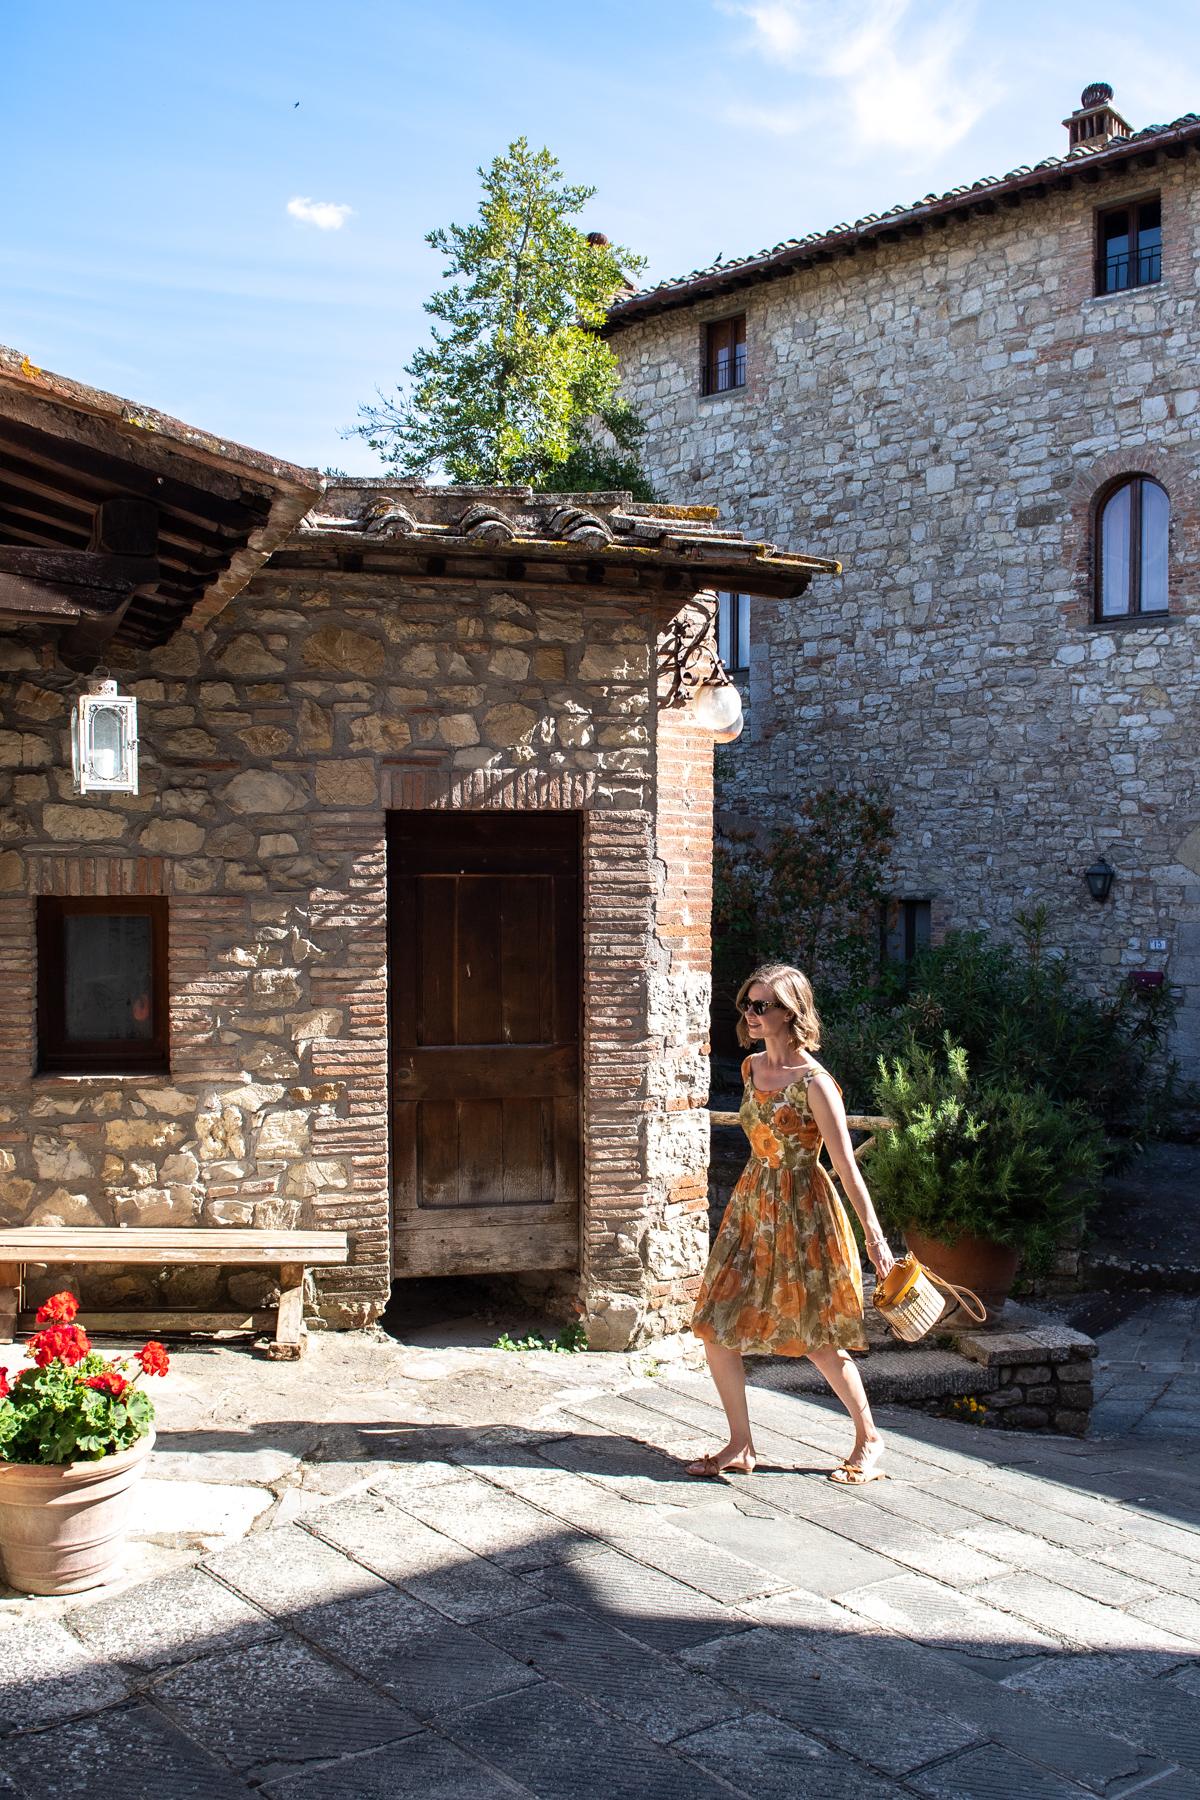 Stacie Flinner x Cuvee Tuscan Farmhouse Tuscany Italy Guide-75.jpg